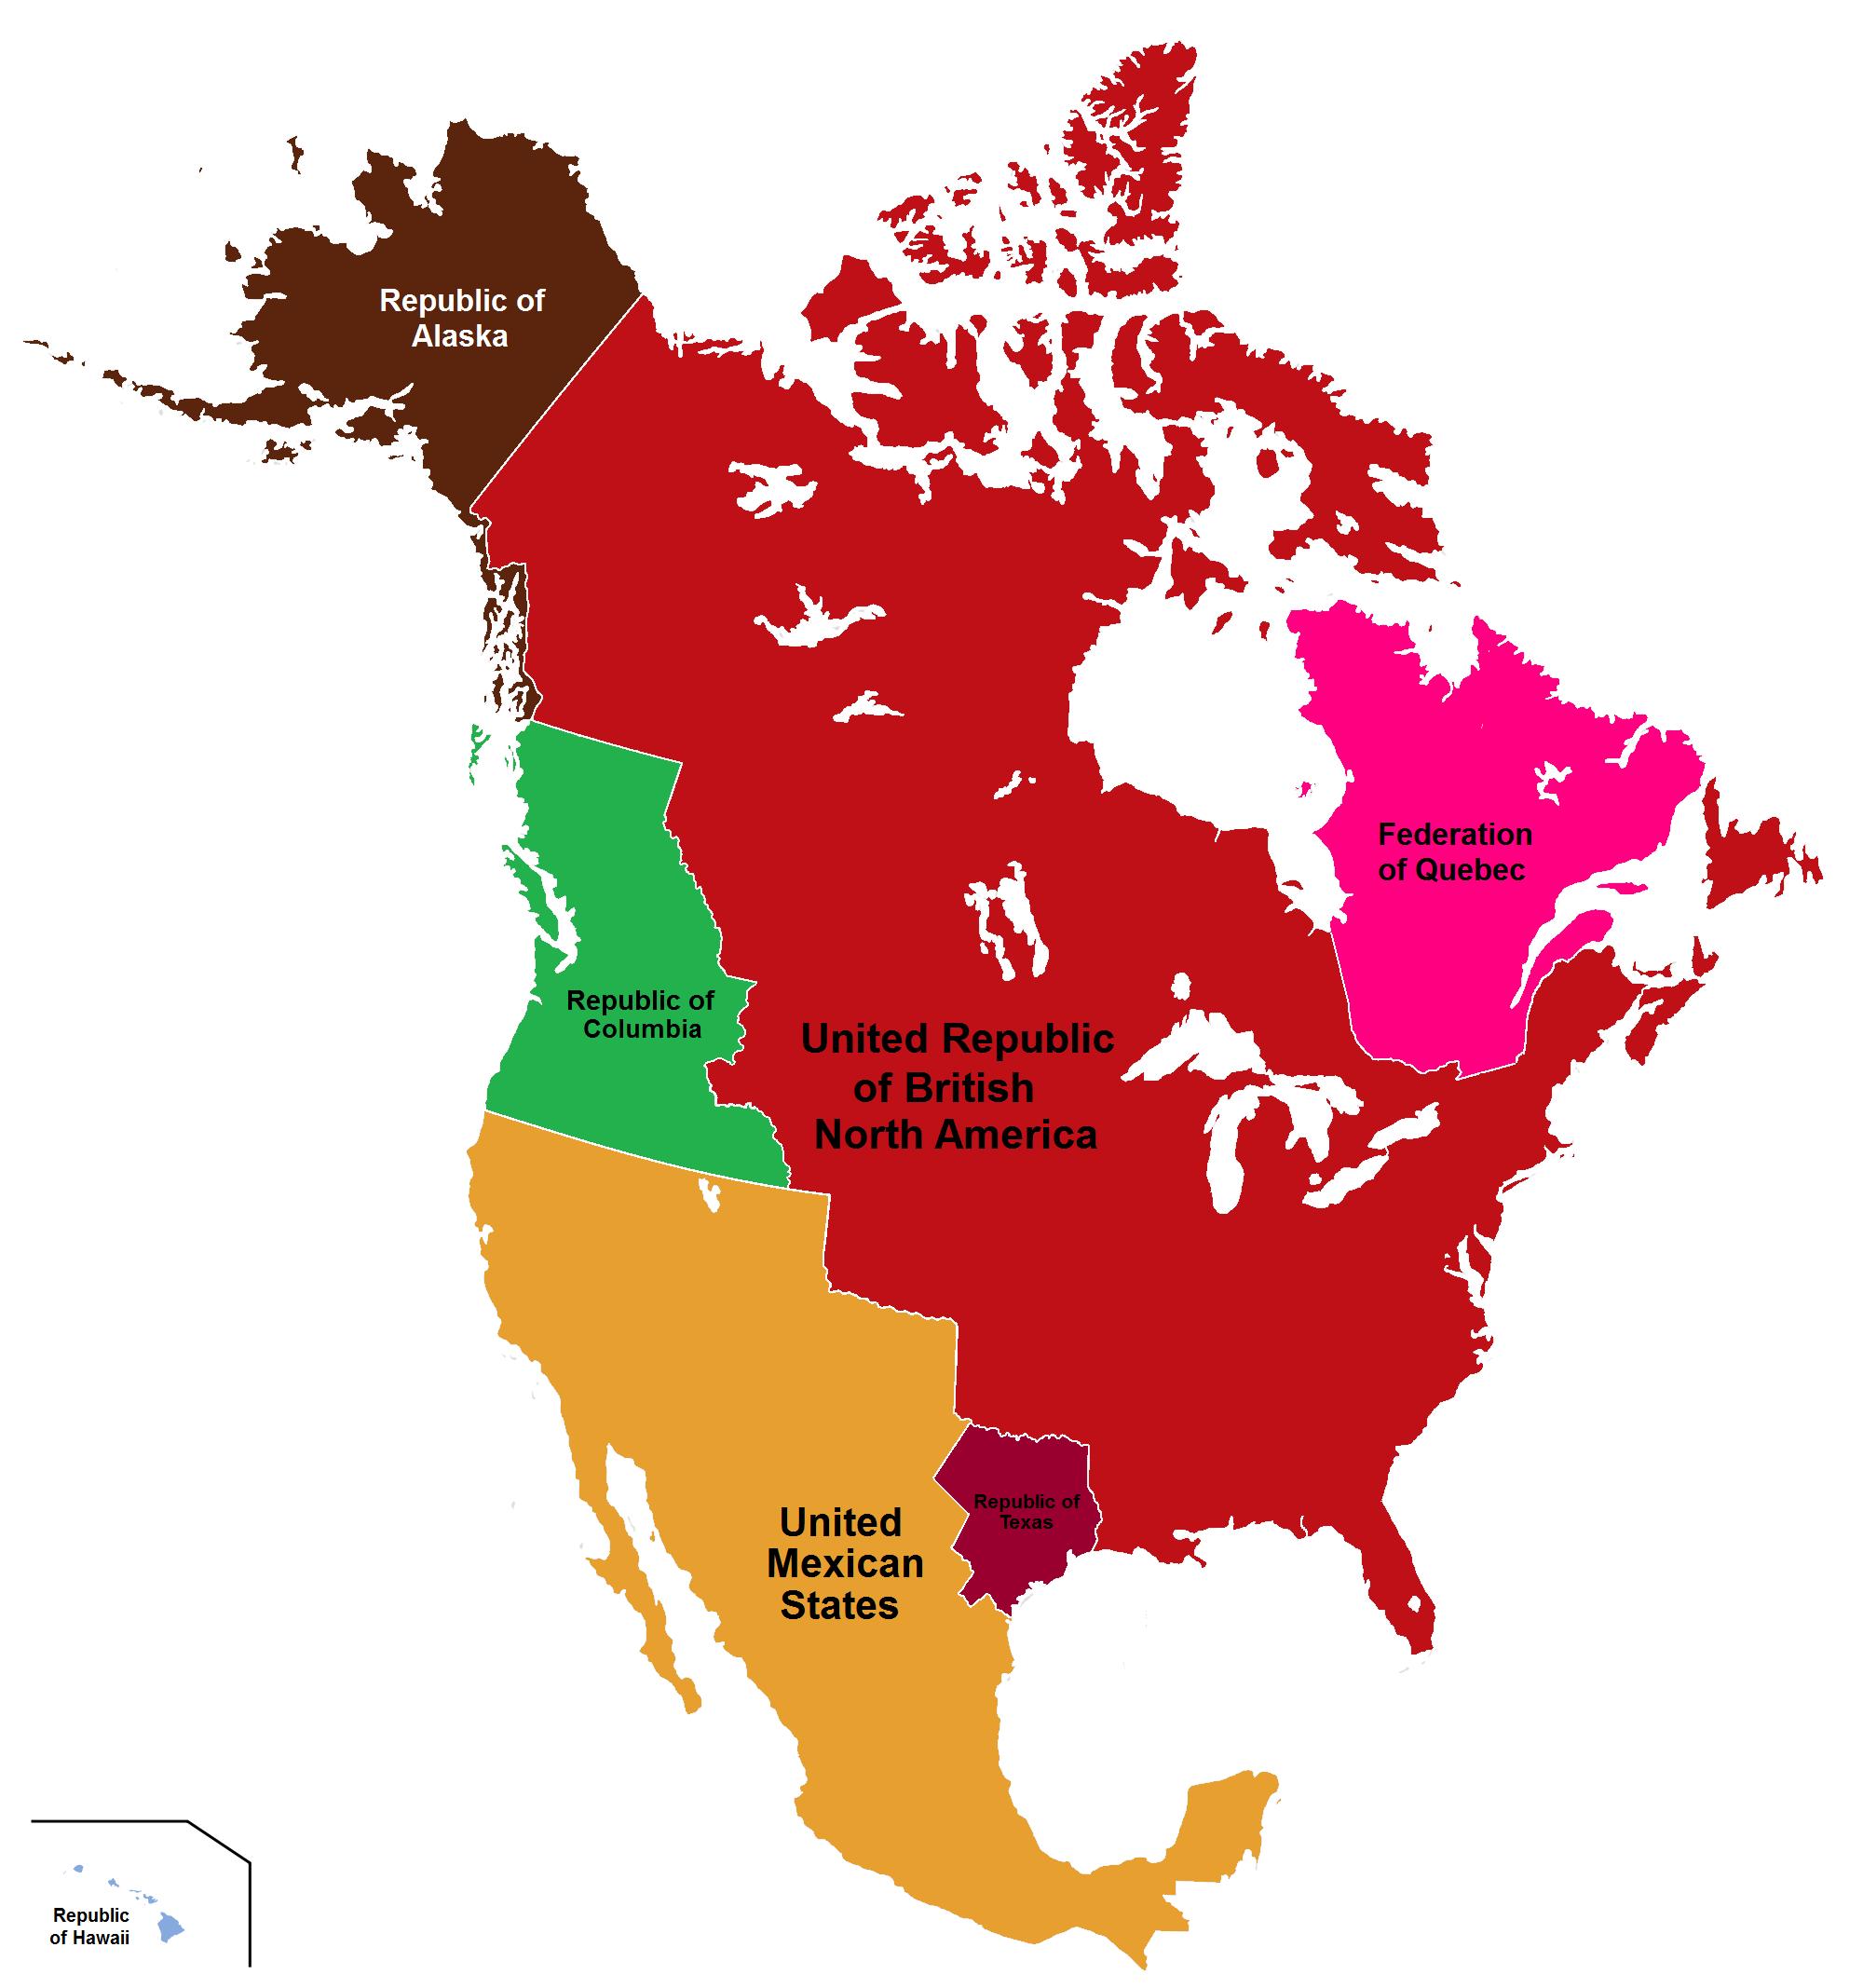 Maps (their British America) on